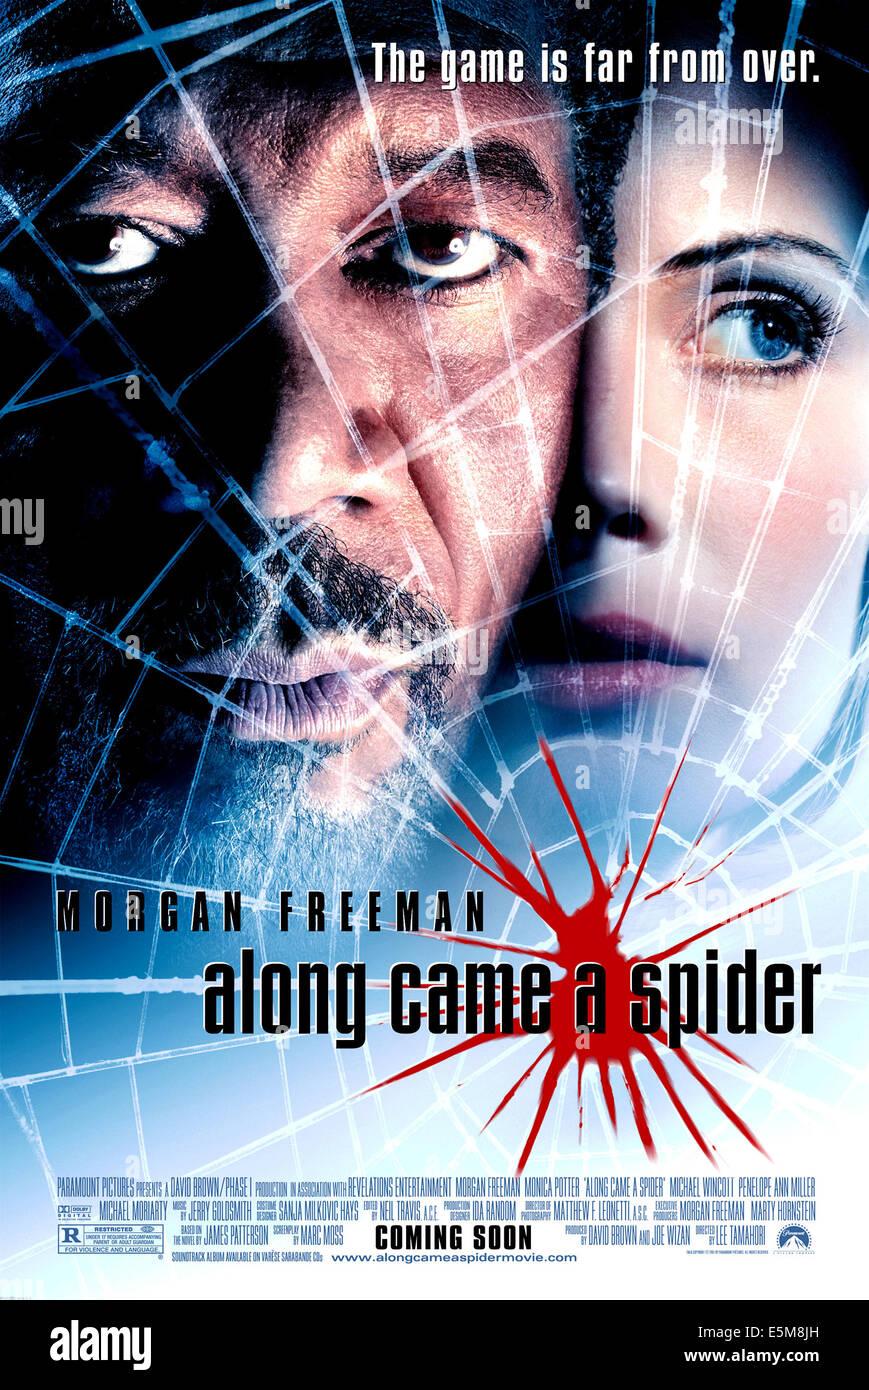 ALONG CAME A SPIDER, Morgan Freeman, Monica Potter, 2001 - Stock Image